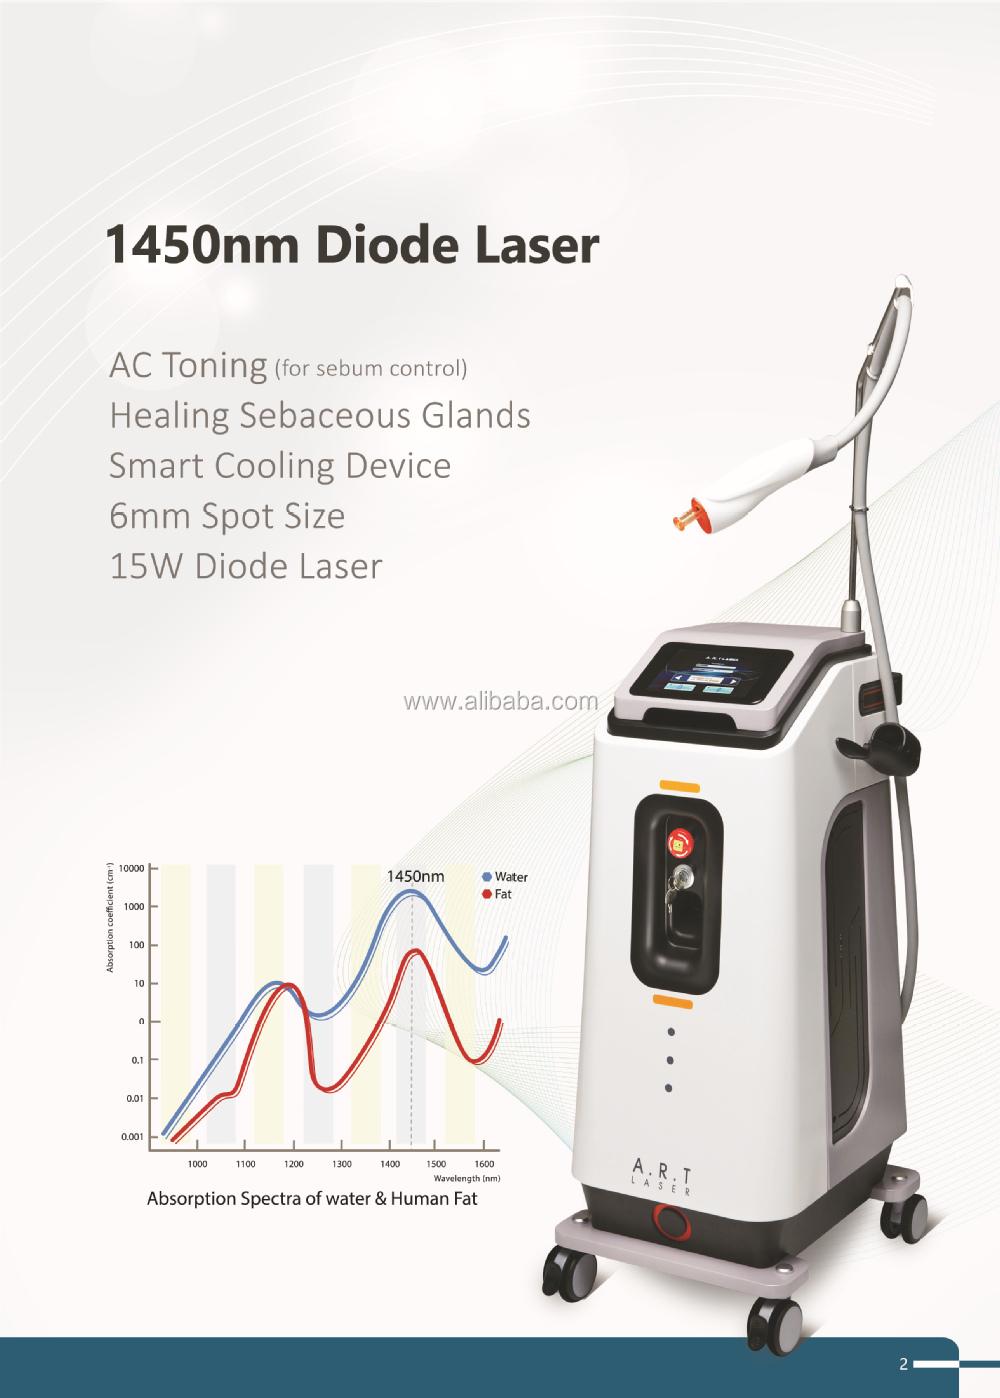 A R T Laser Buy 1450nm Diode Laser Made In Korea